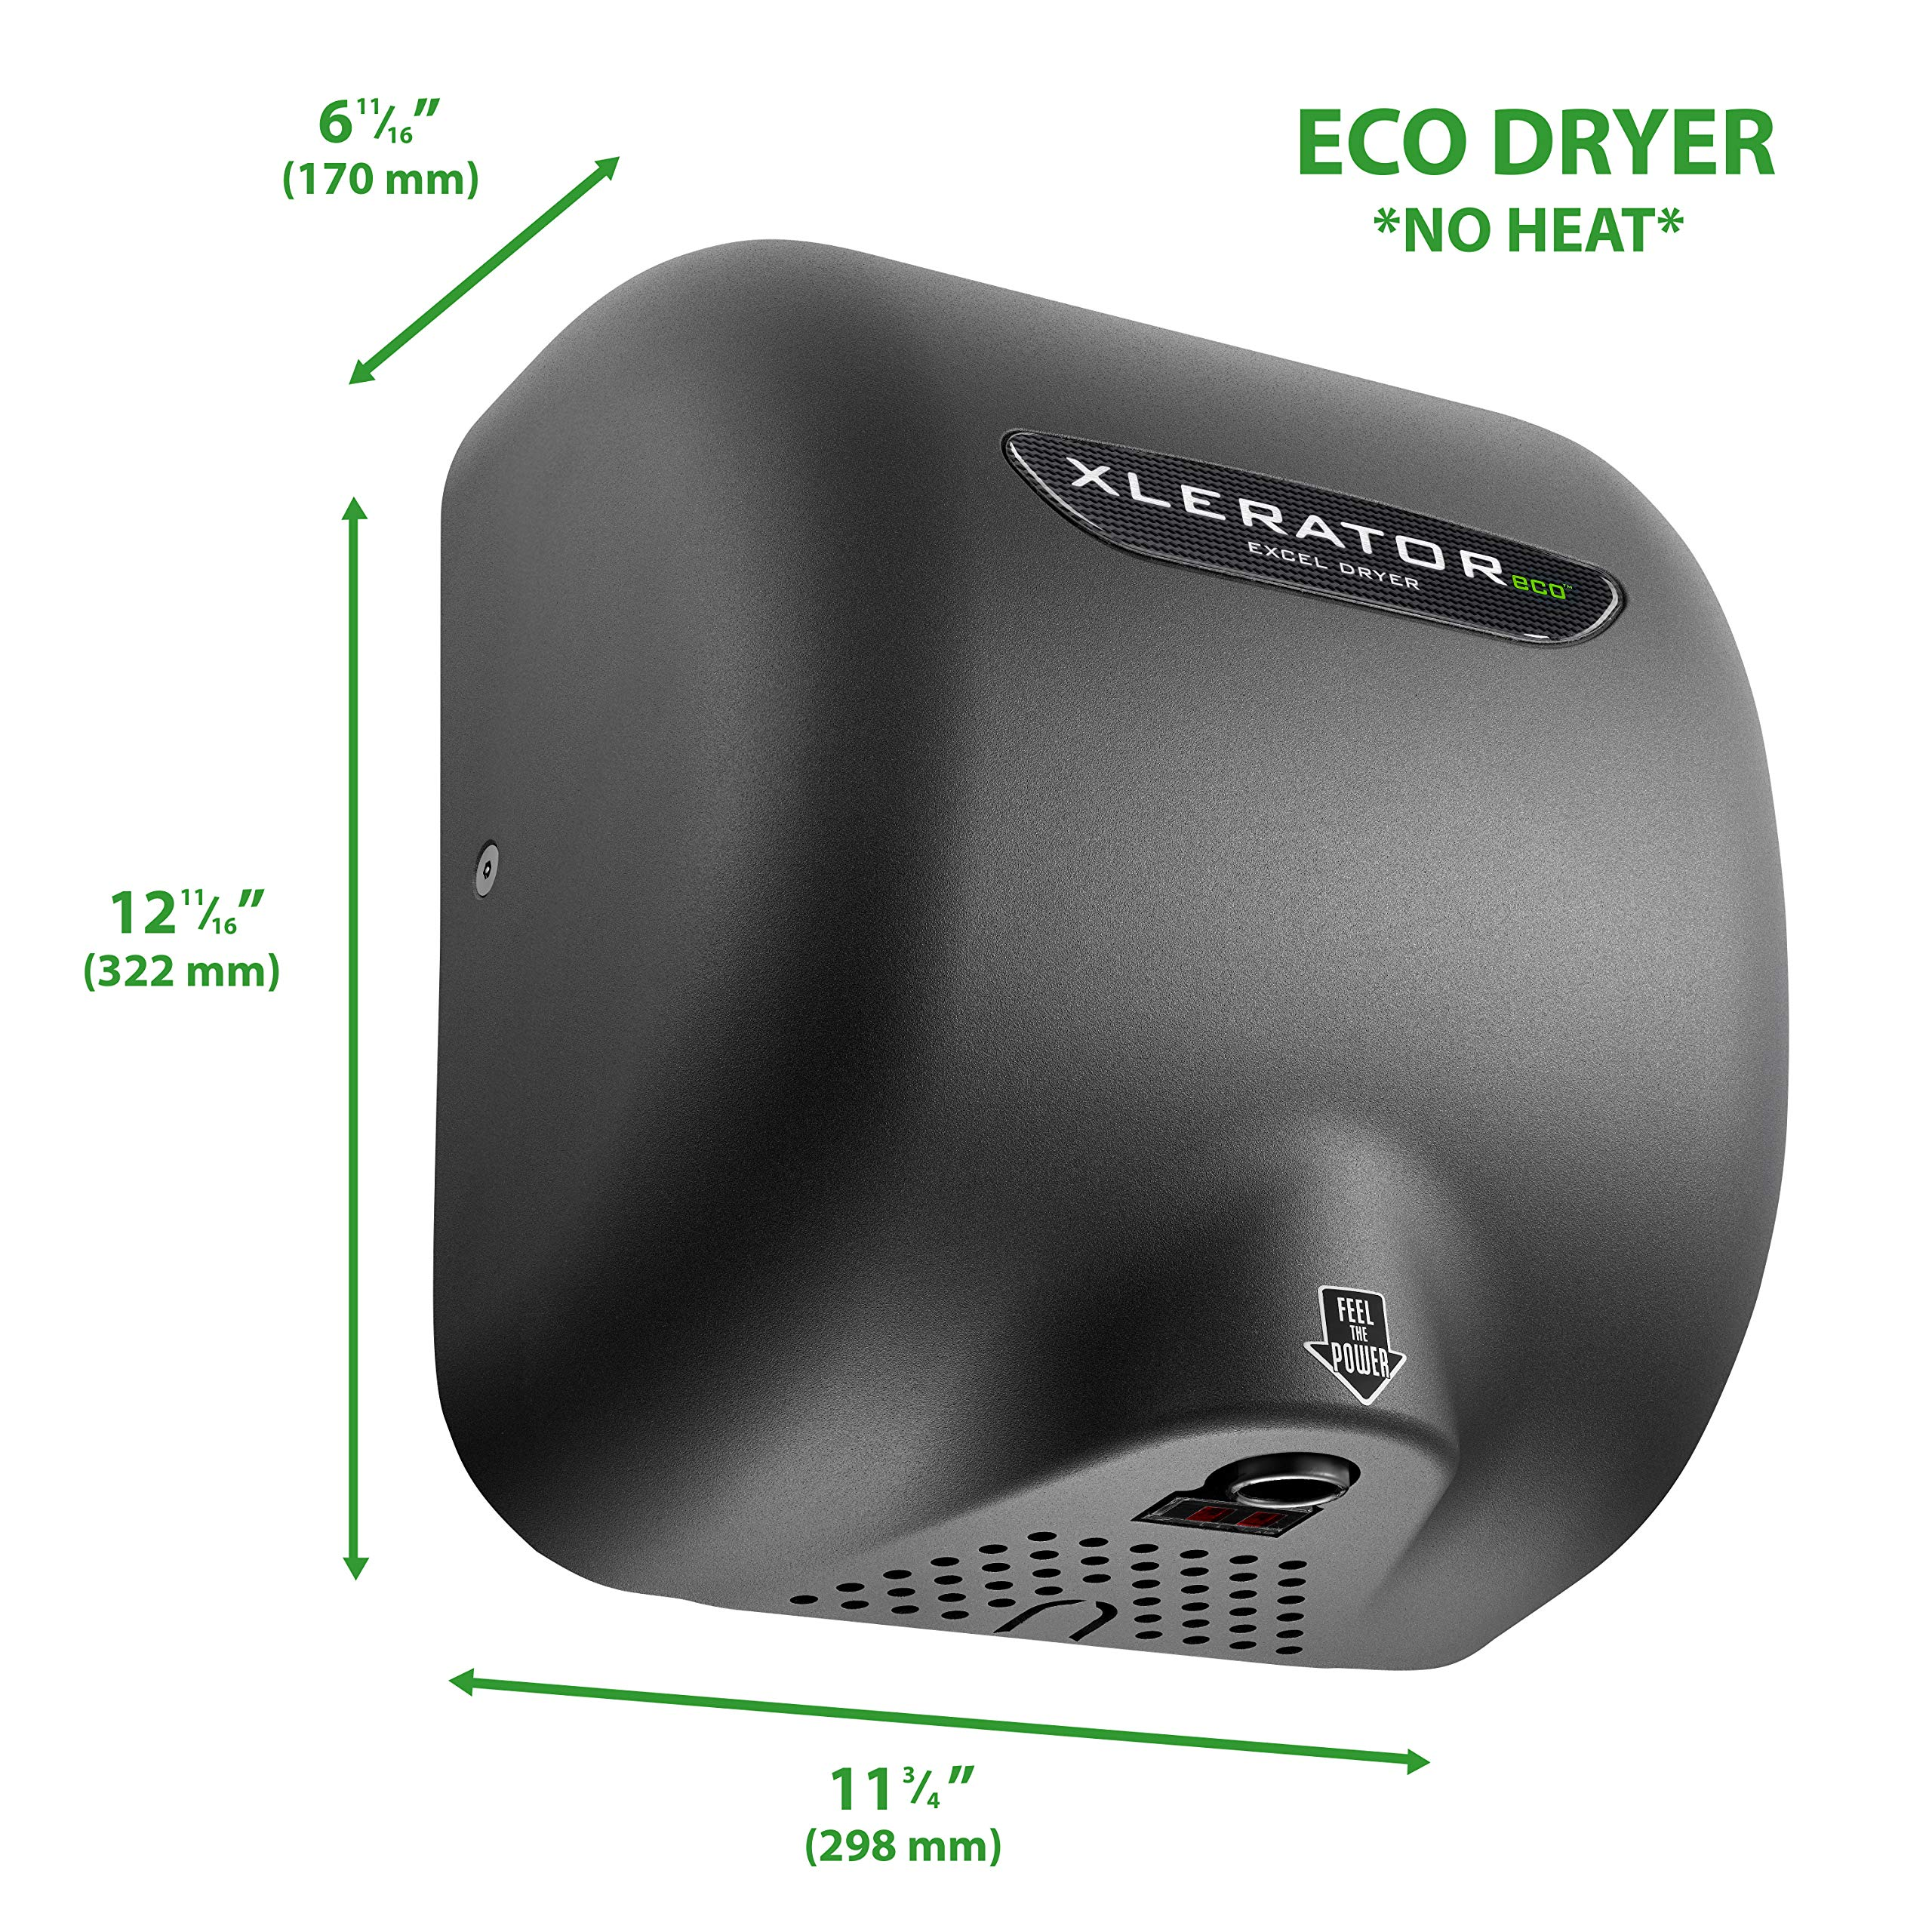 Excel Dryer XL-GR-ECO XLERATOR Hand Dryer Textured Graphite Cover 110-120V